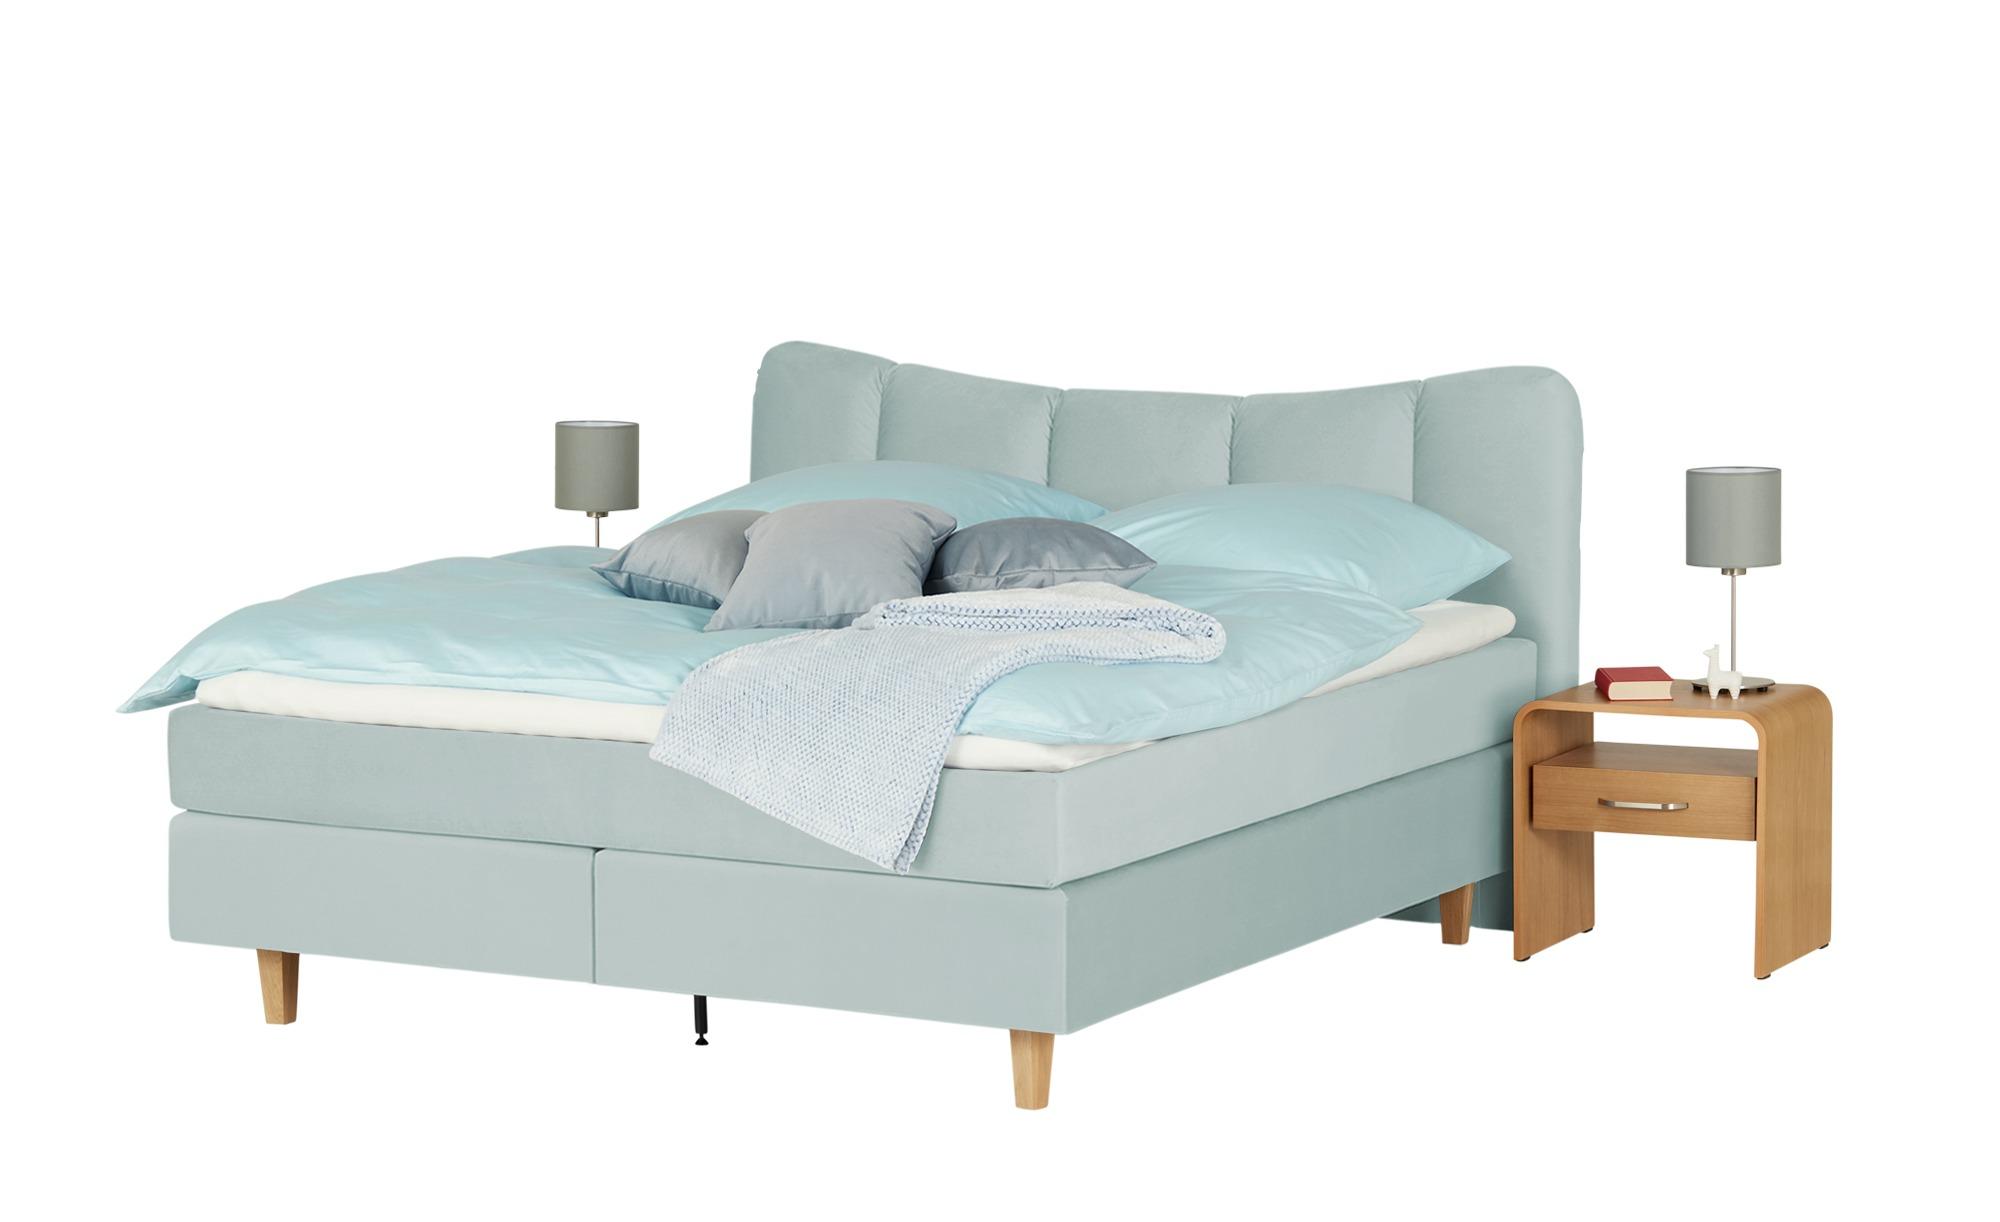 #Boxspringbett  Dalur 140 x 200 cm Eisblau – SKAGEN BEDS#